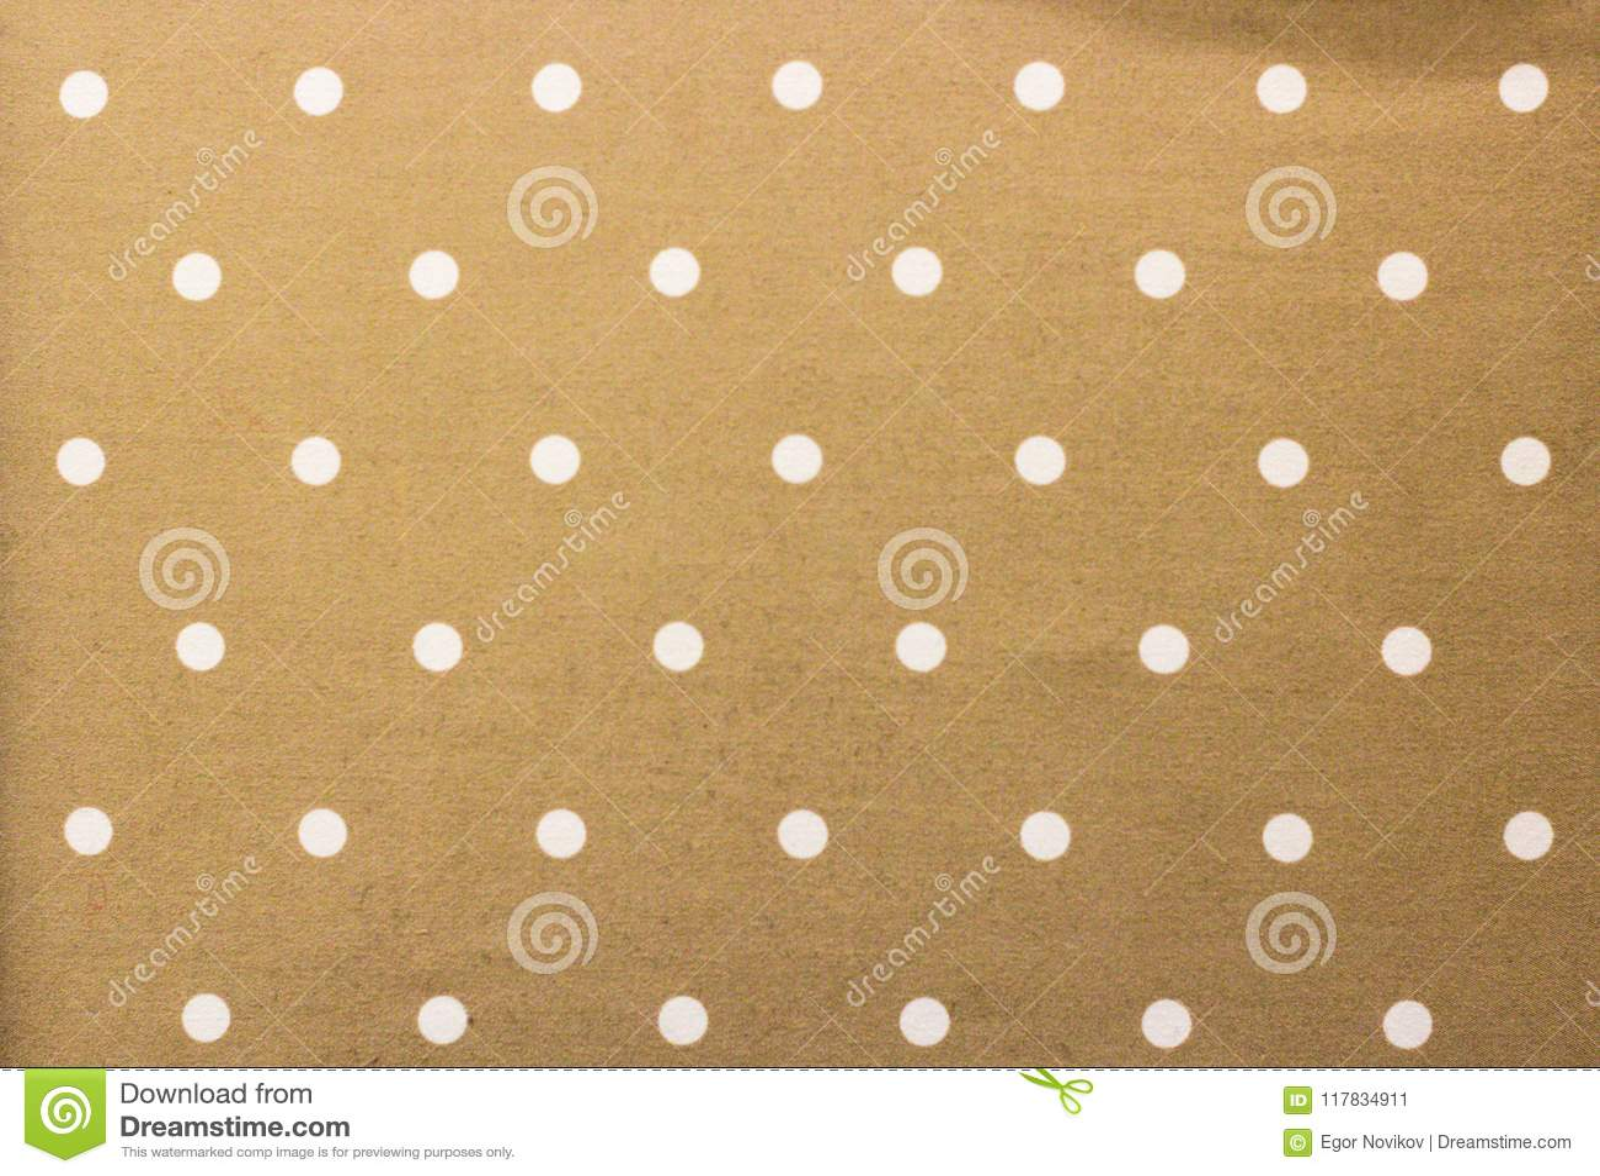 Guld- tyg och en vit mycket liten prickbakgrund